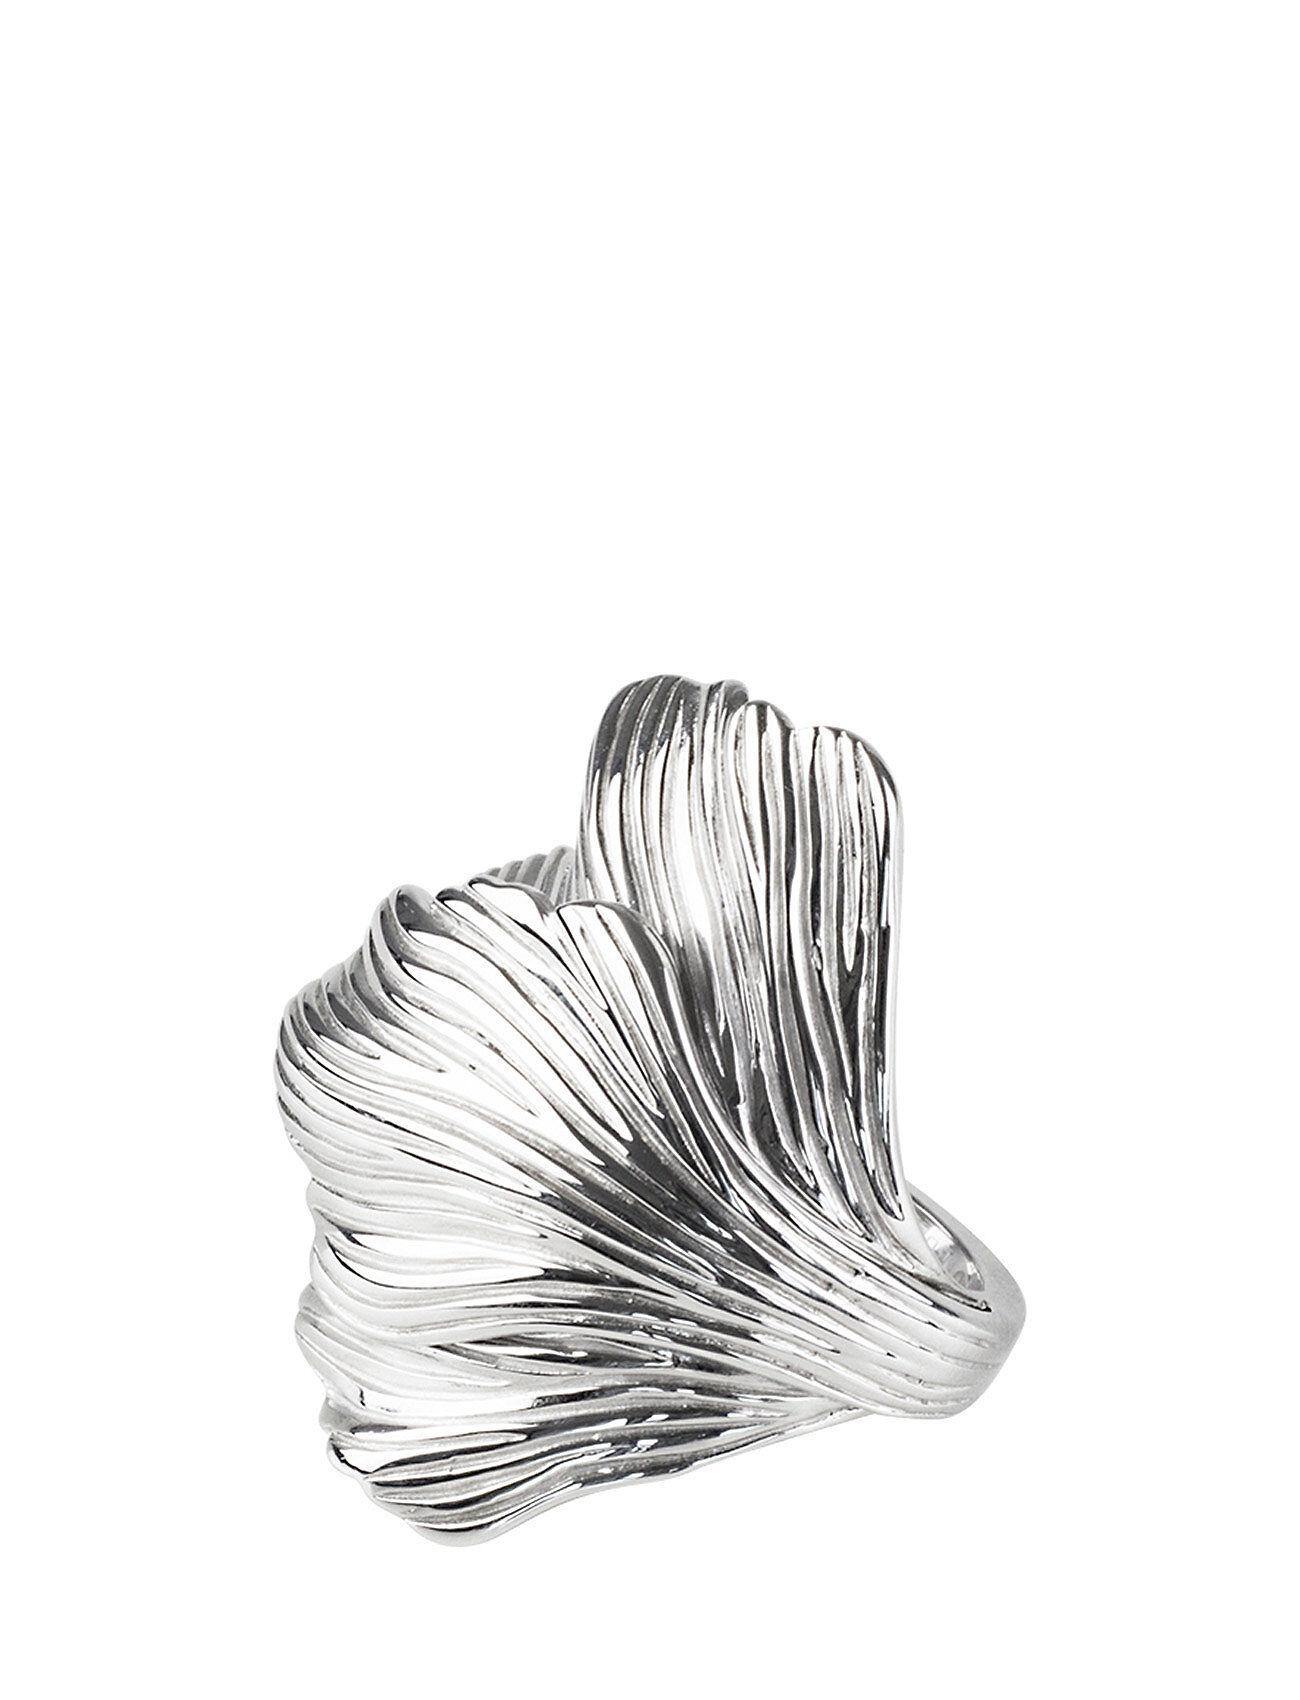 Dyrberg/Kern Gian